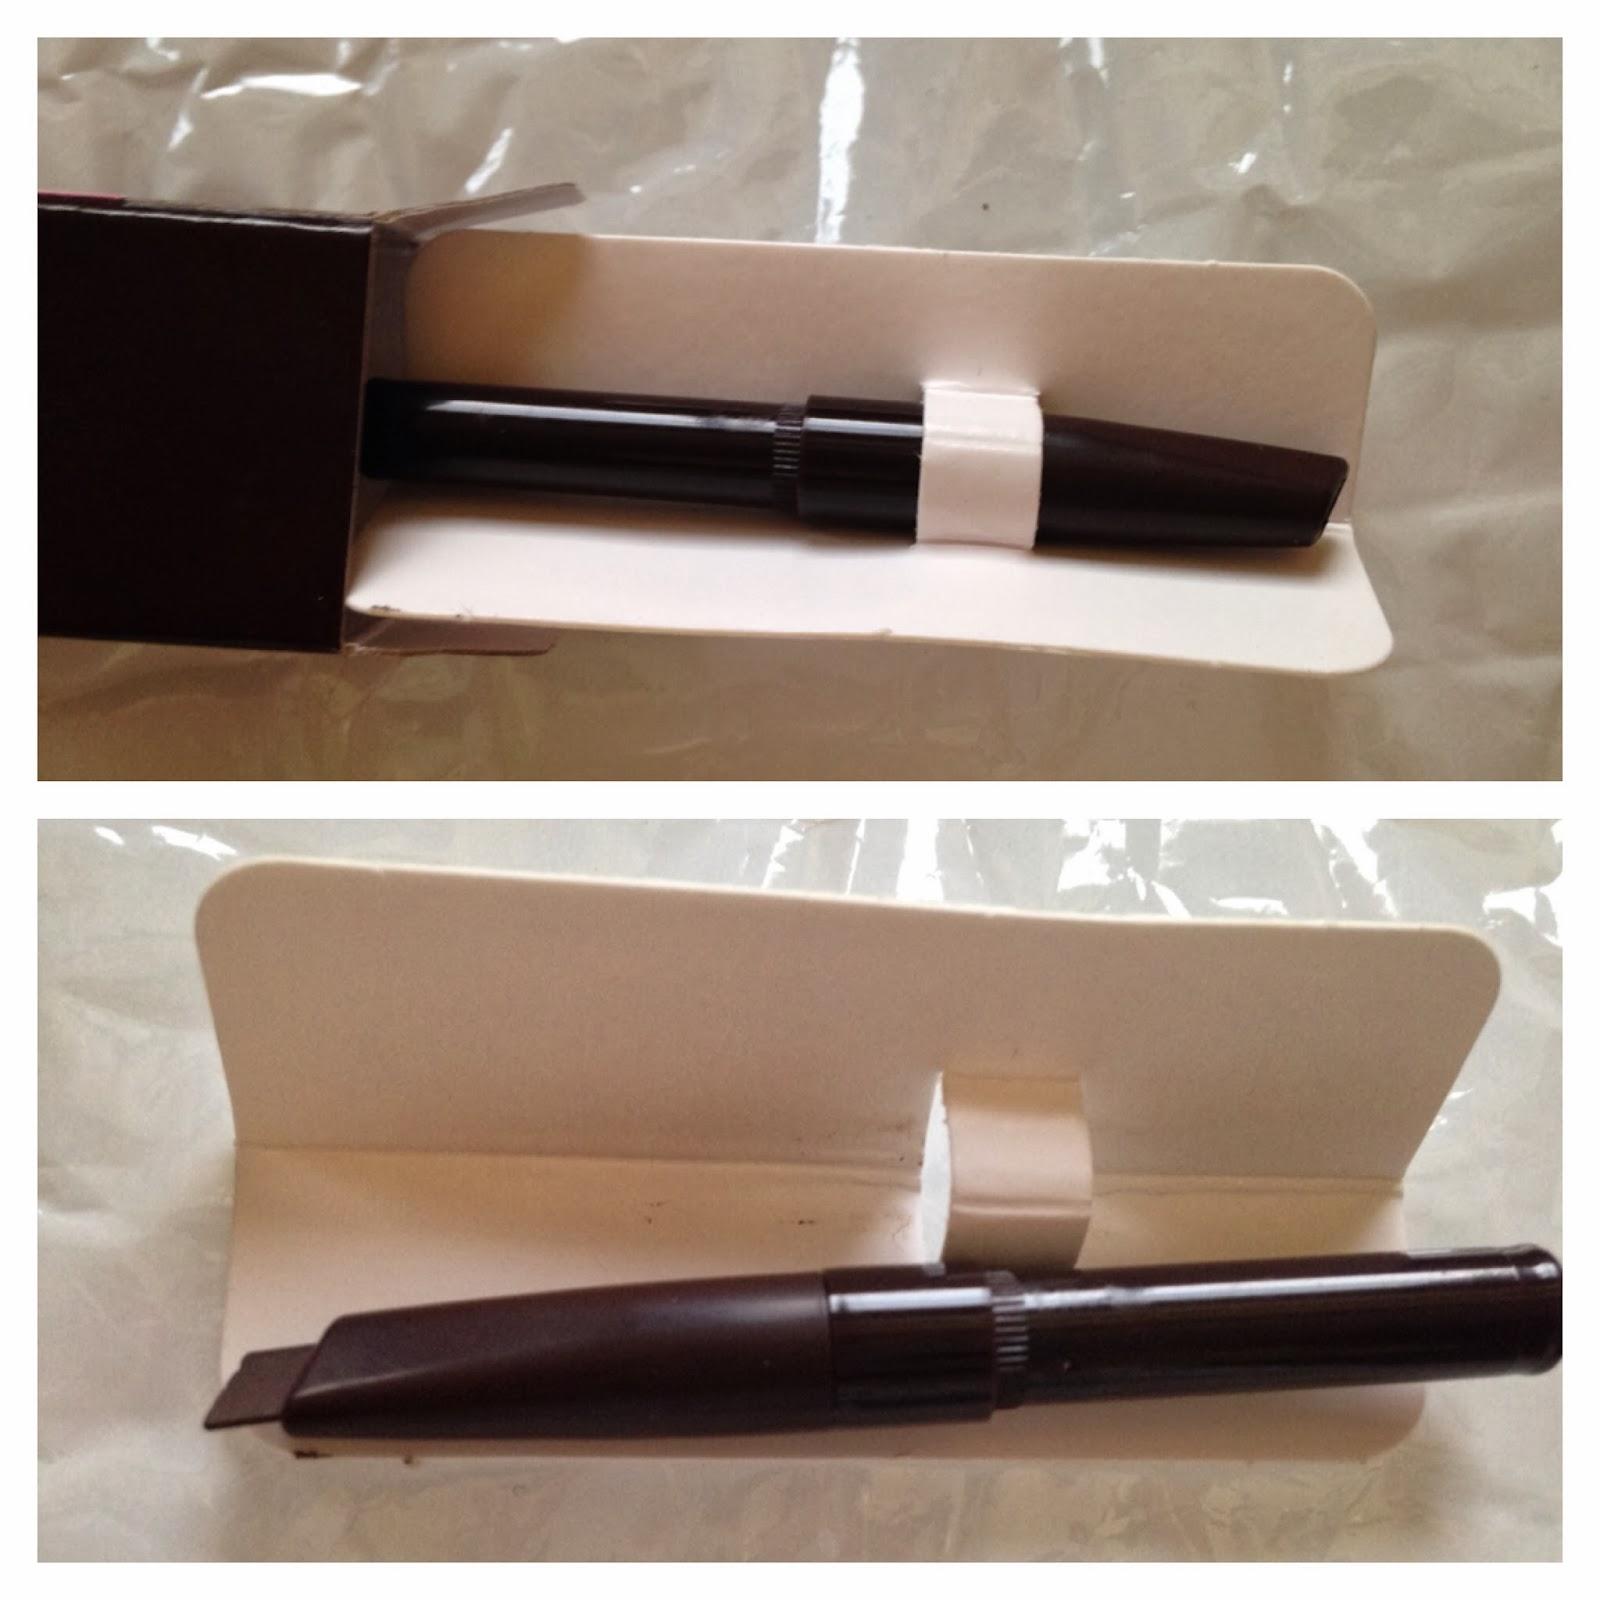 Aeris Hart Etude House Drawing Eye Brow Refill Review Eyebrow Pencil